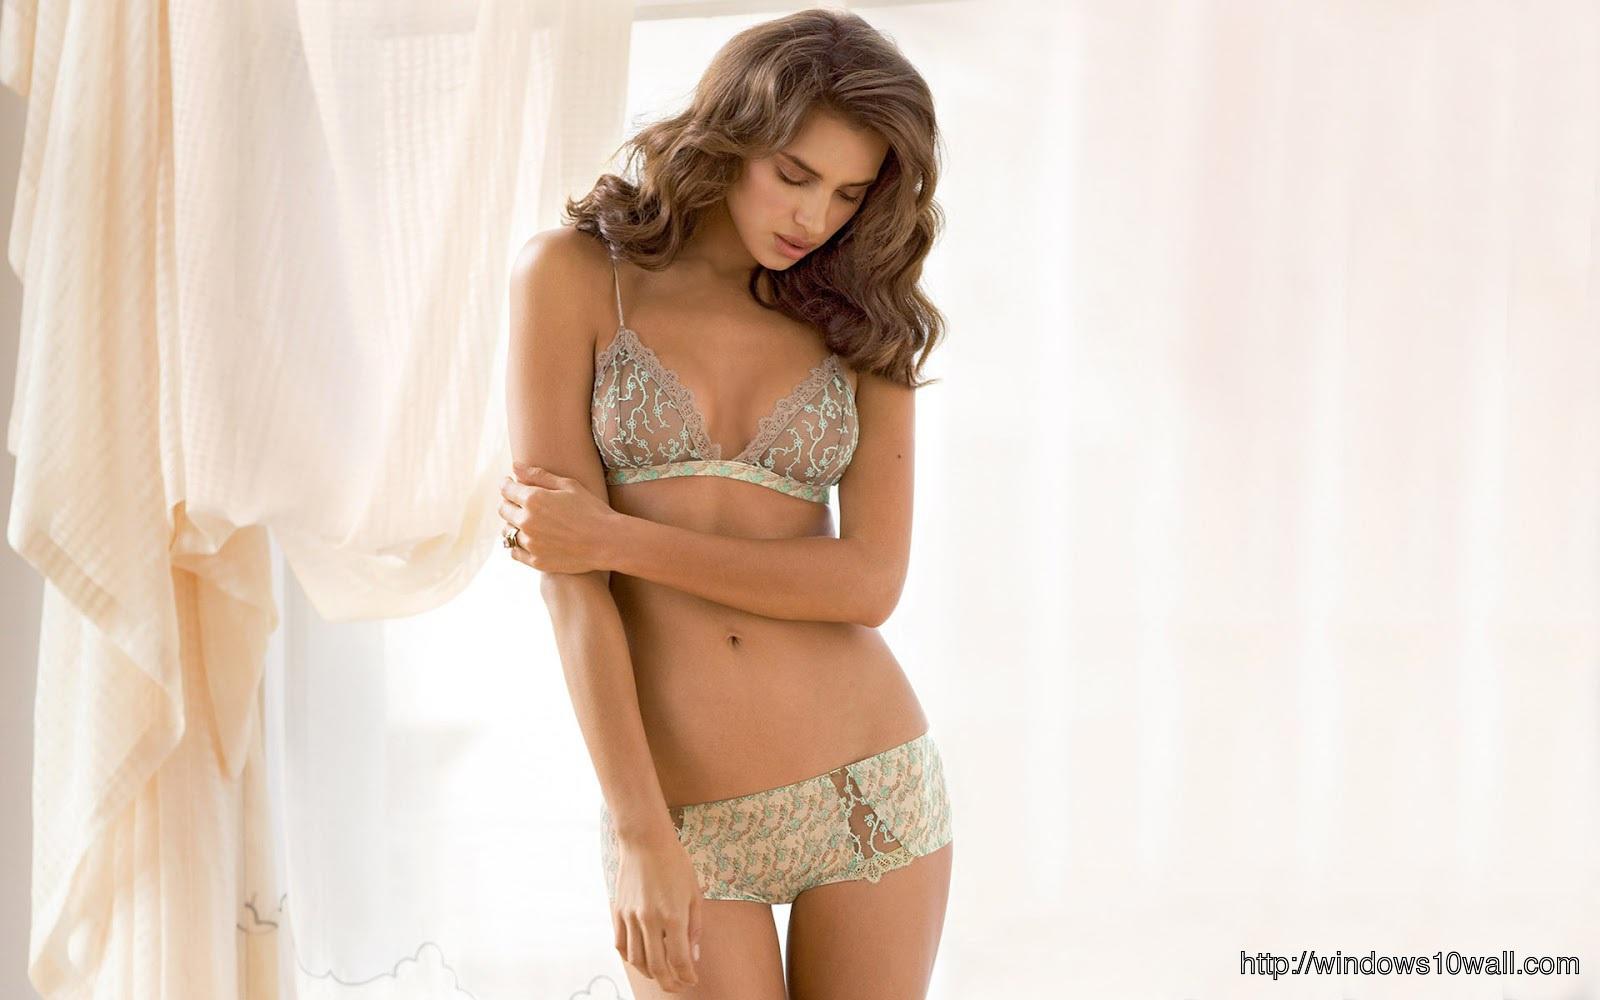 Sexy girl wallpaper